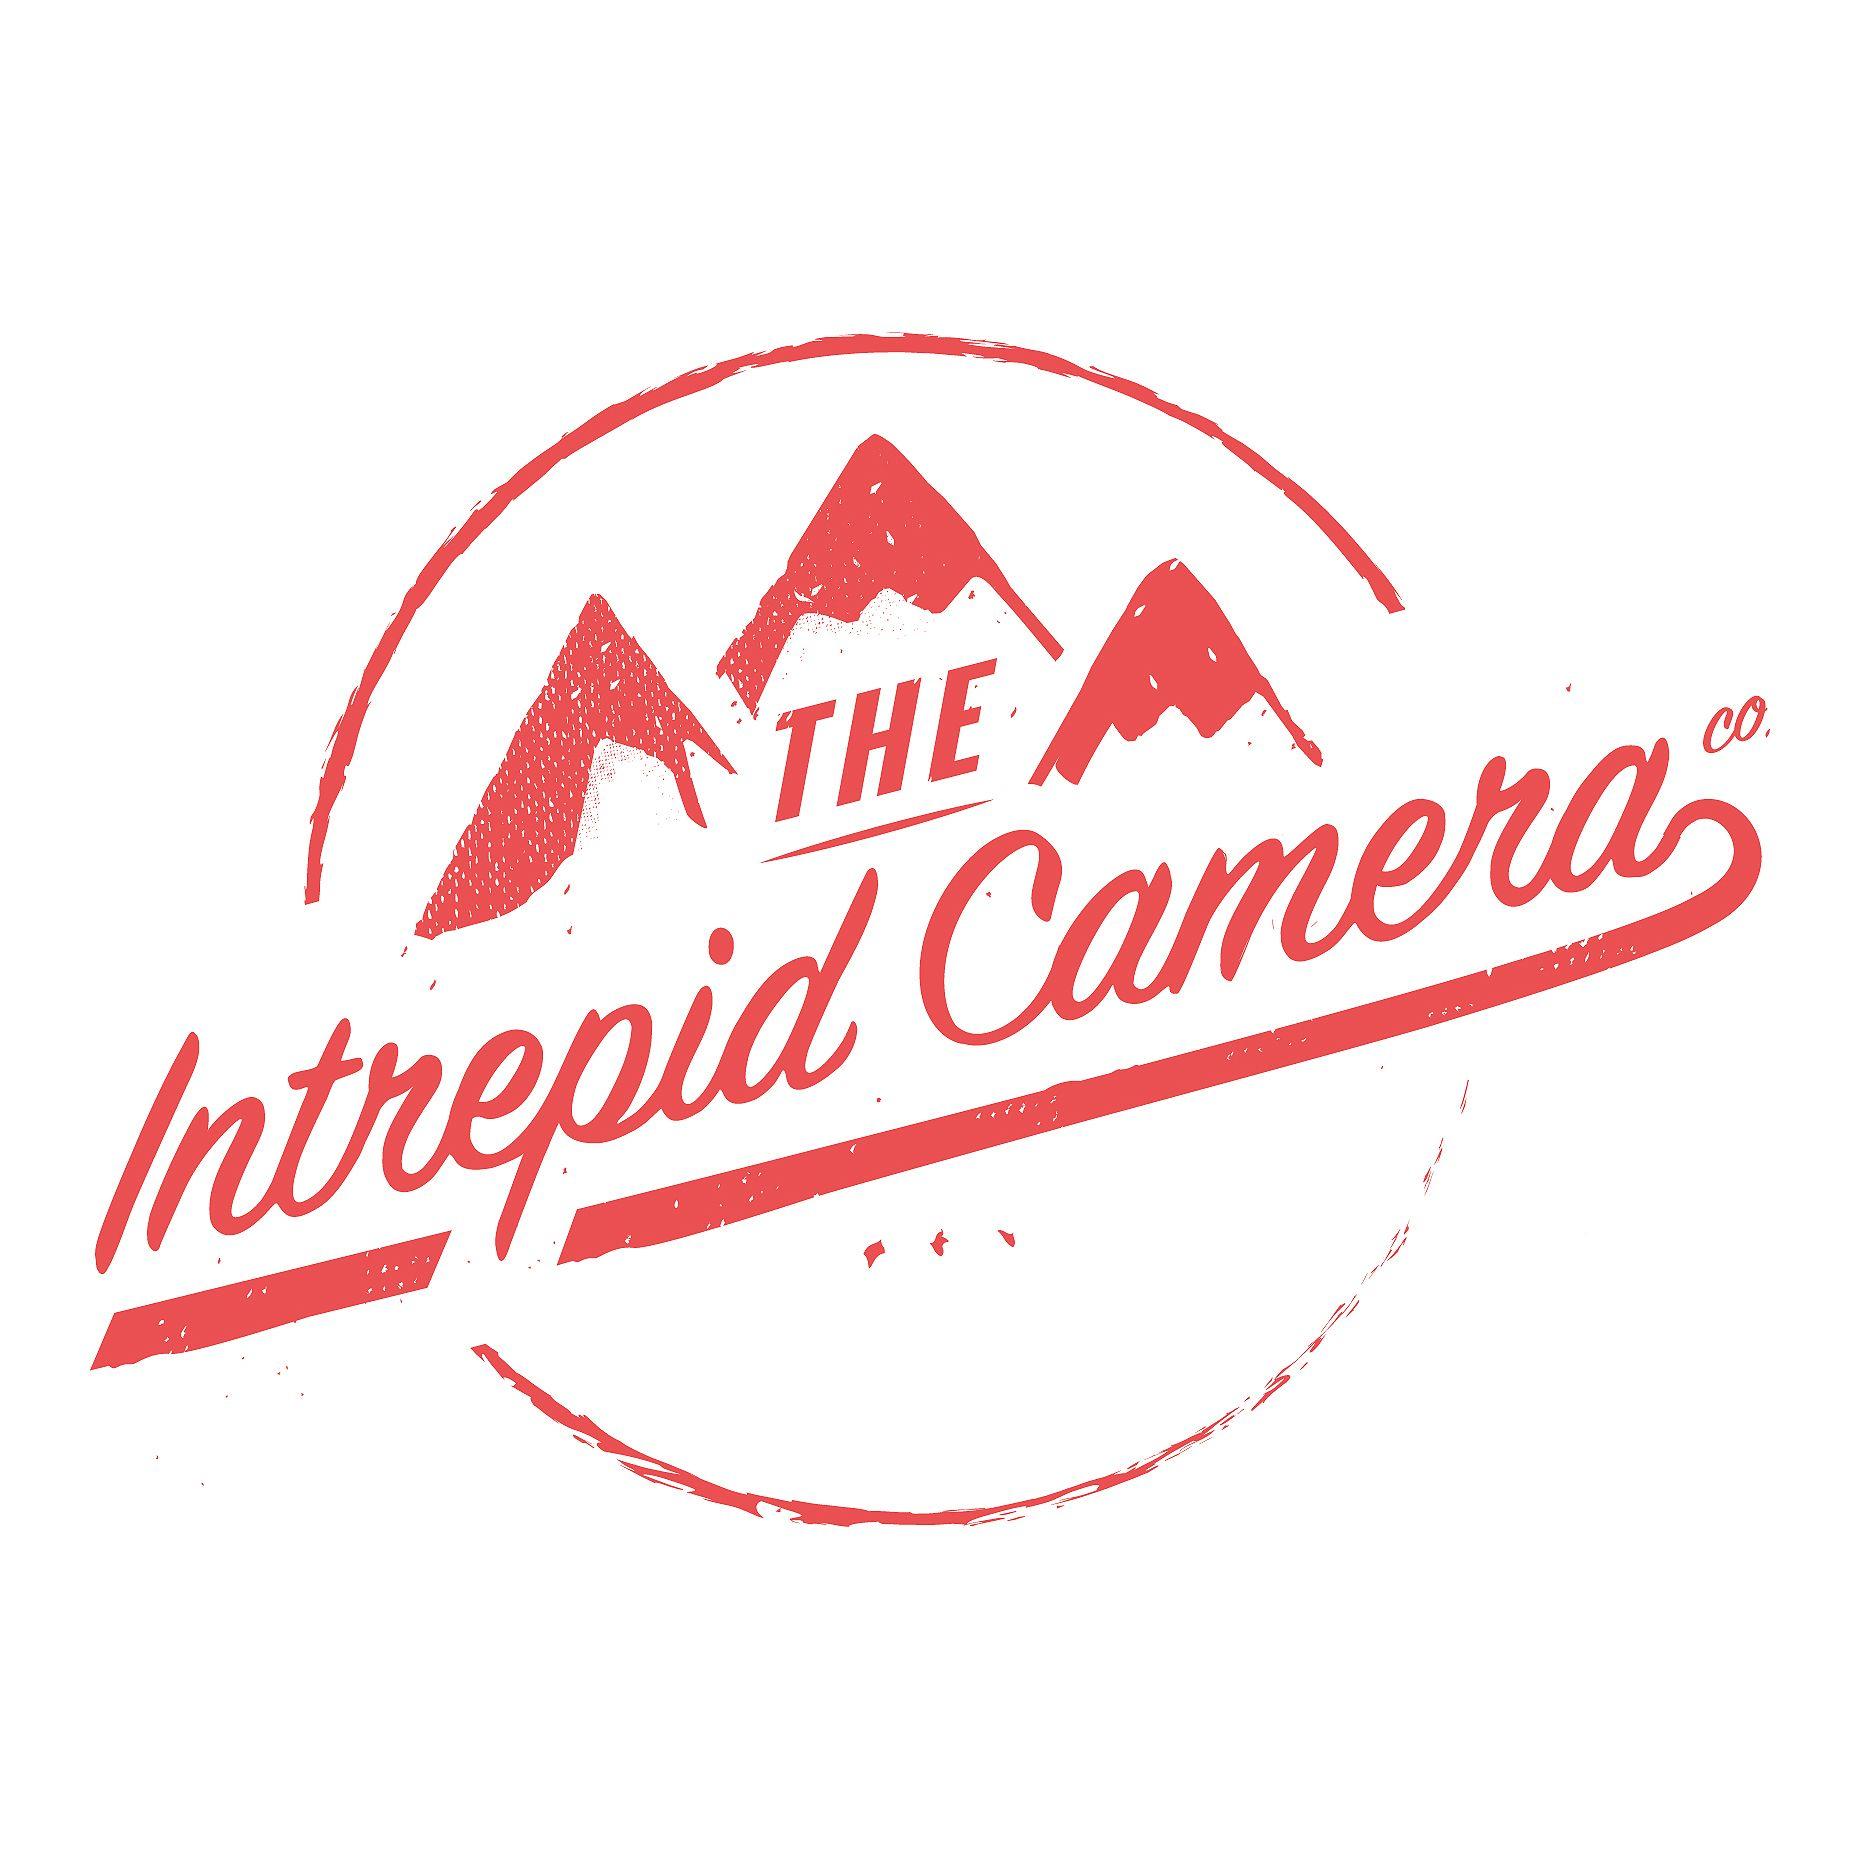 The Intrepid Camera Company